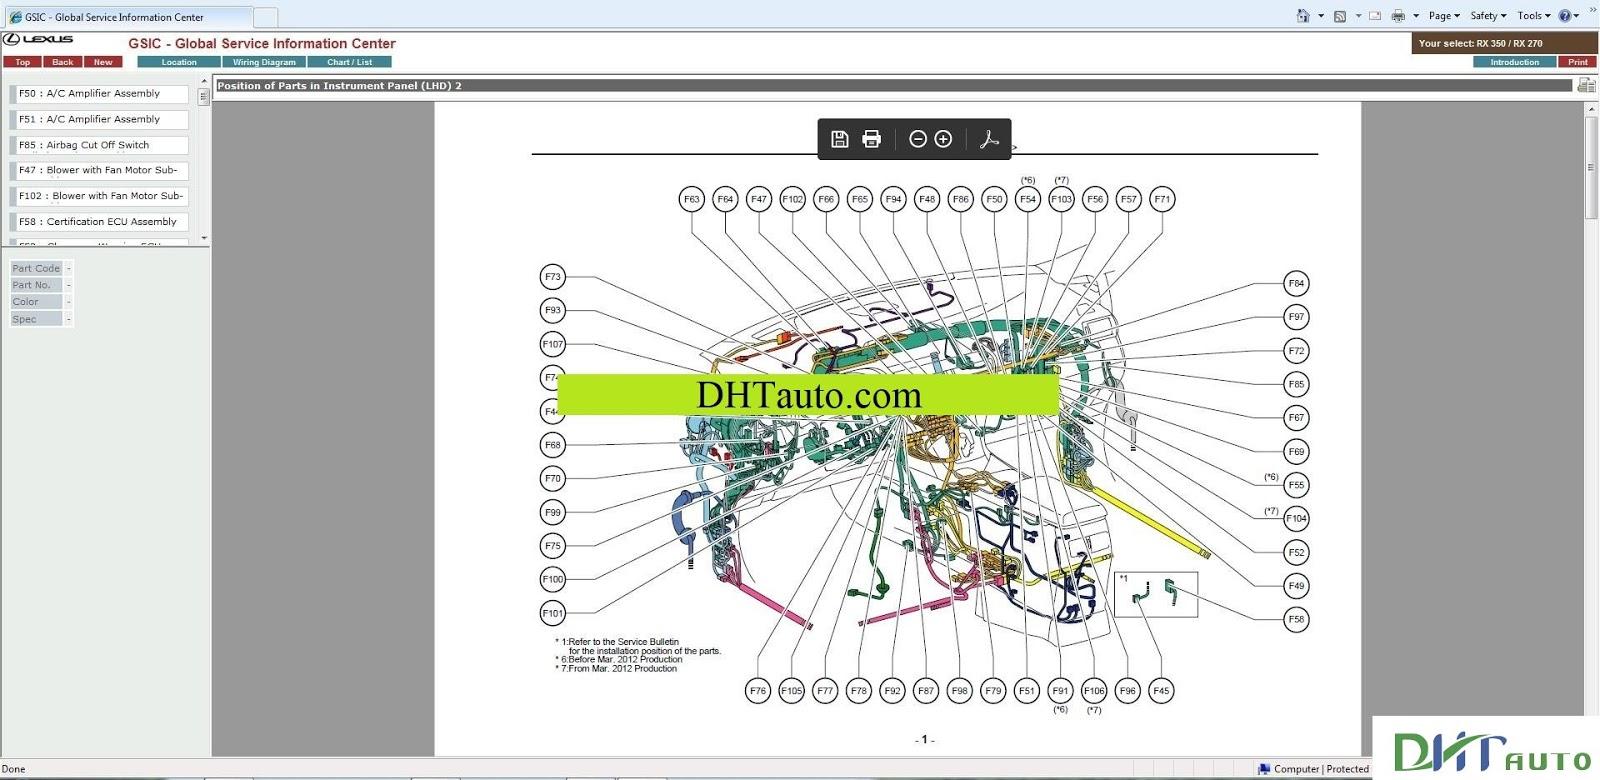 lexus rx 450h wiring diagram wiring librarylexus rx 450h wiring diagram [ 1600 x 780 Pixel ]